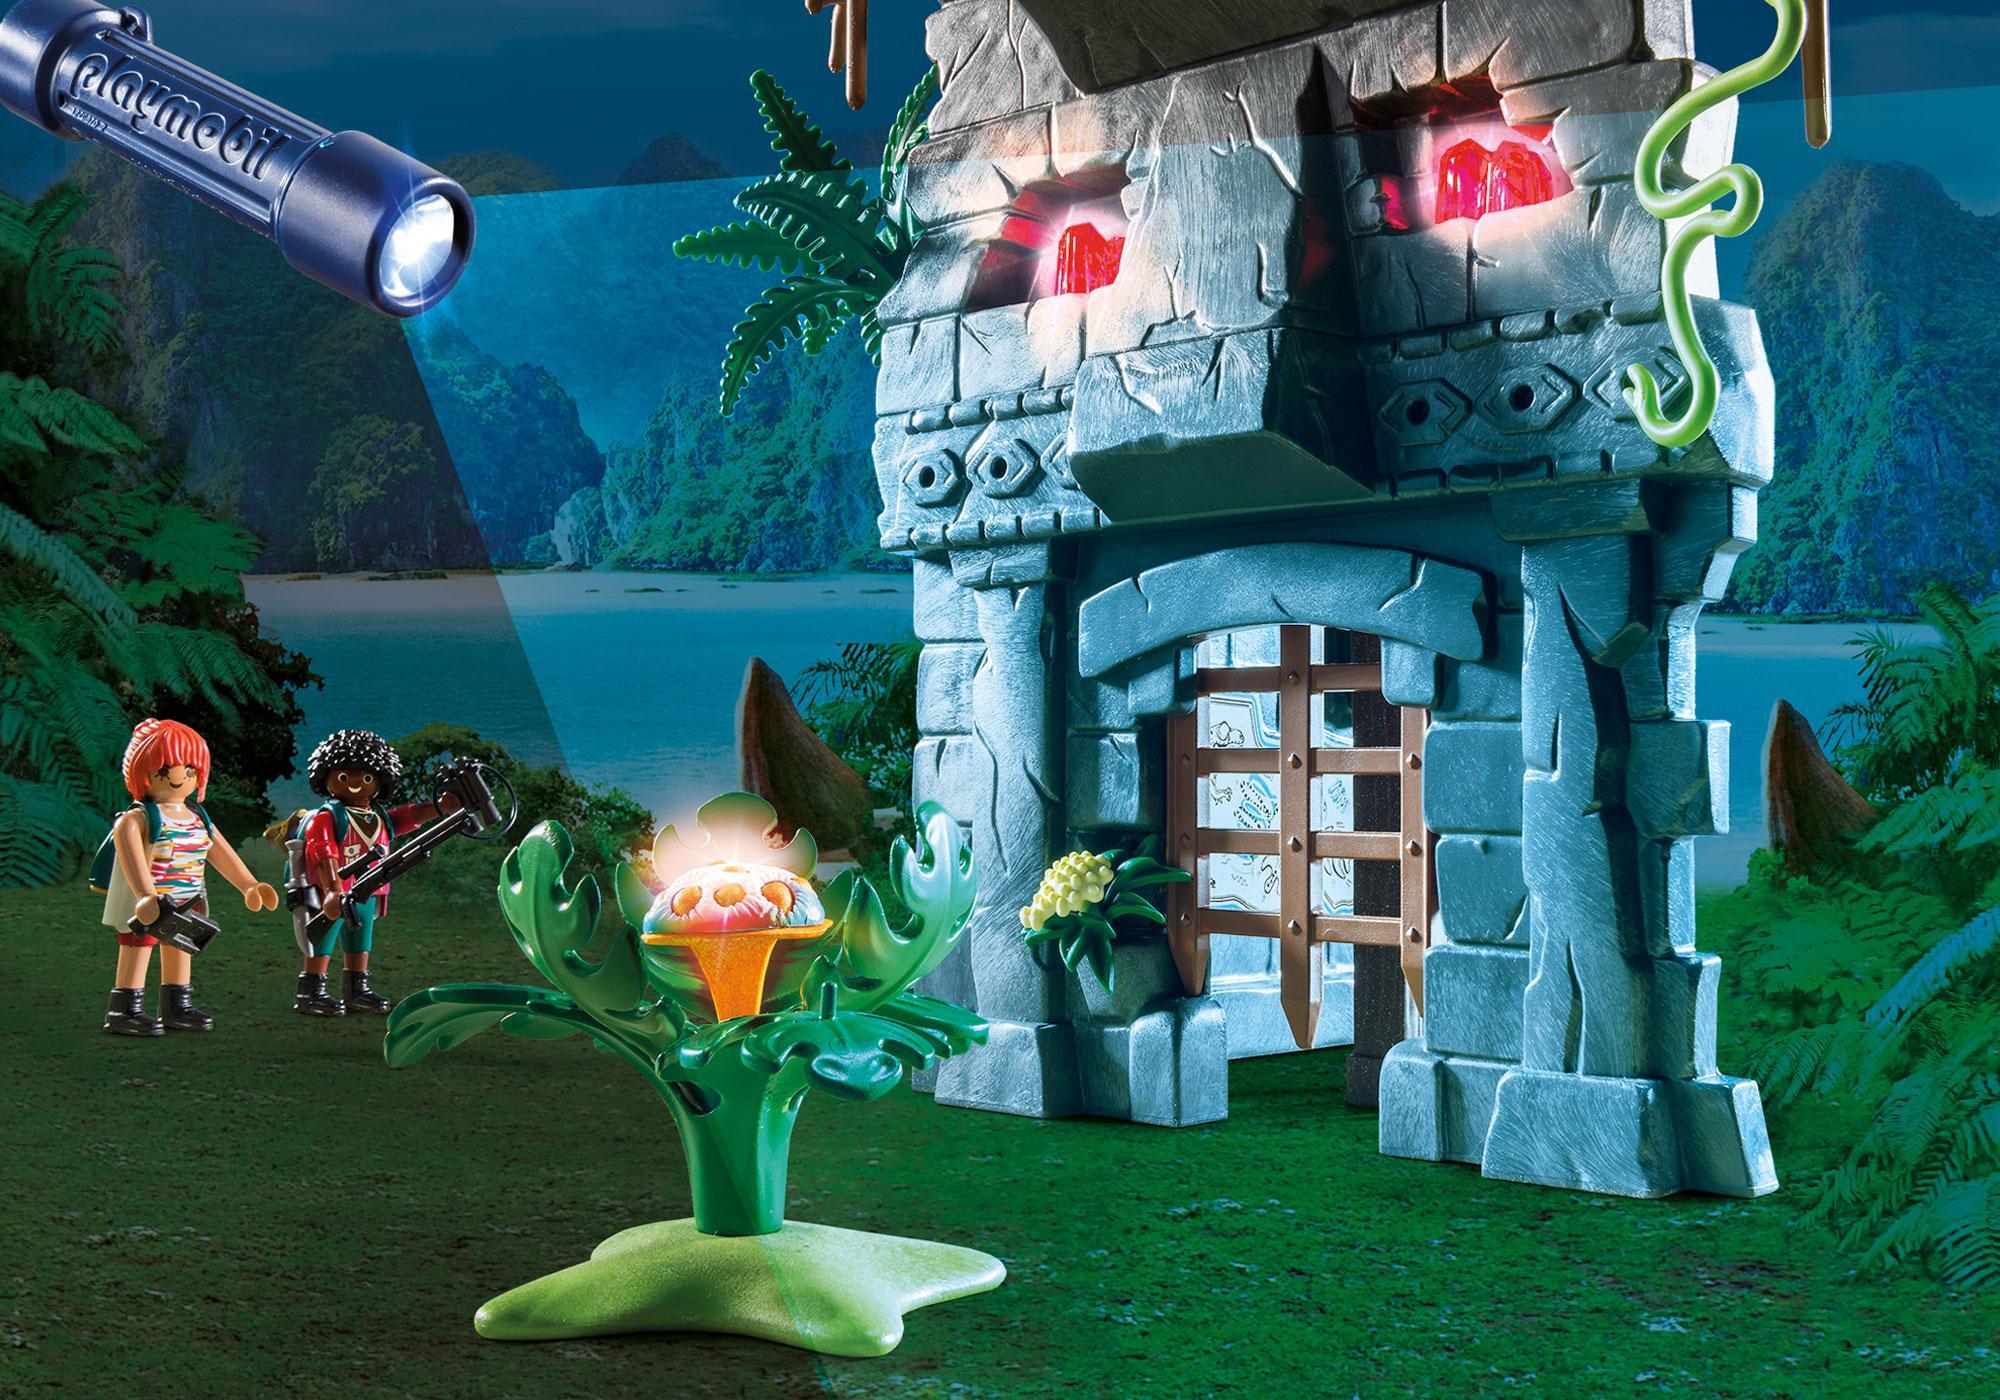 http://media.playmobil.com/i/playmobil/9429_product_extra1/Αρχηγείο των Εξερευνητών και Τ-Ρεξ